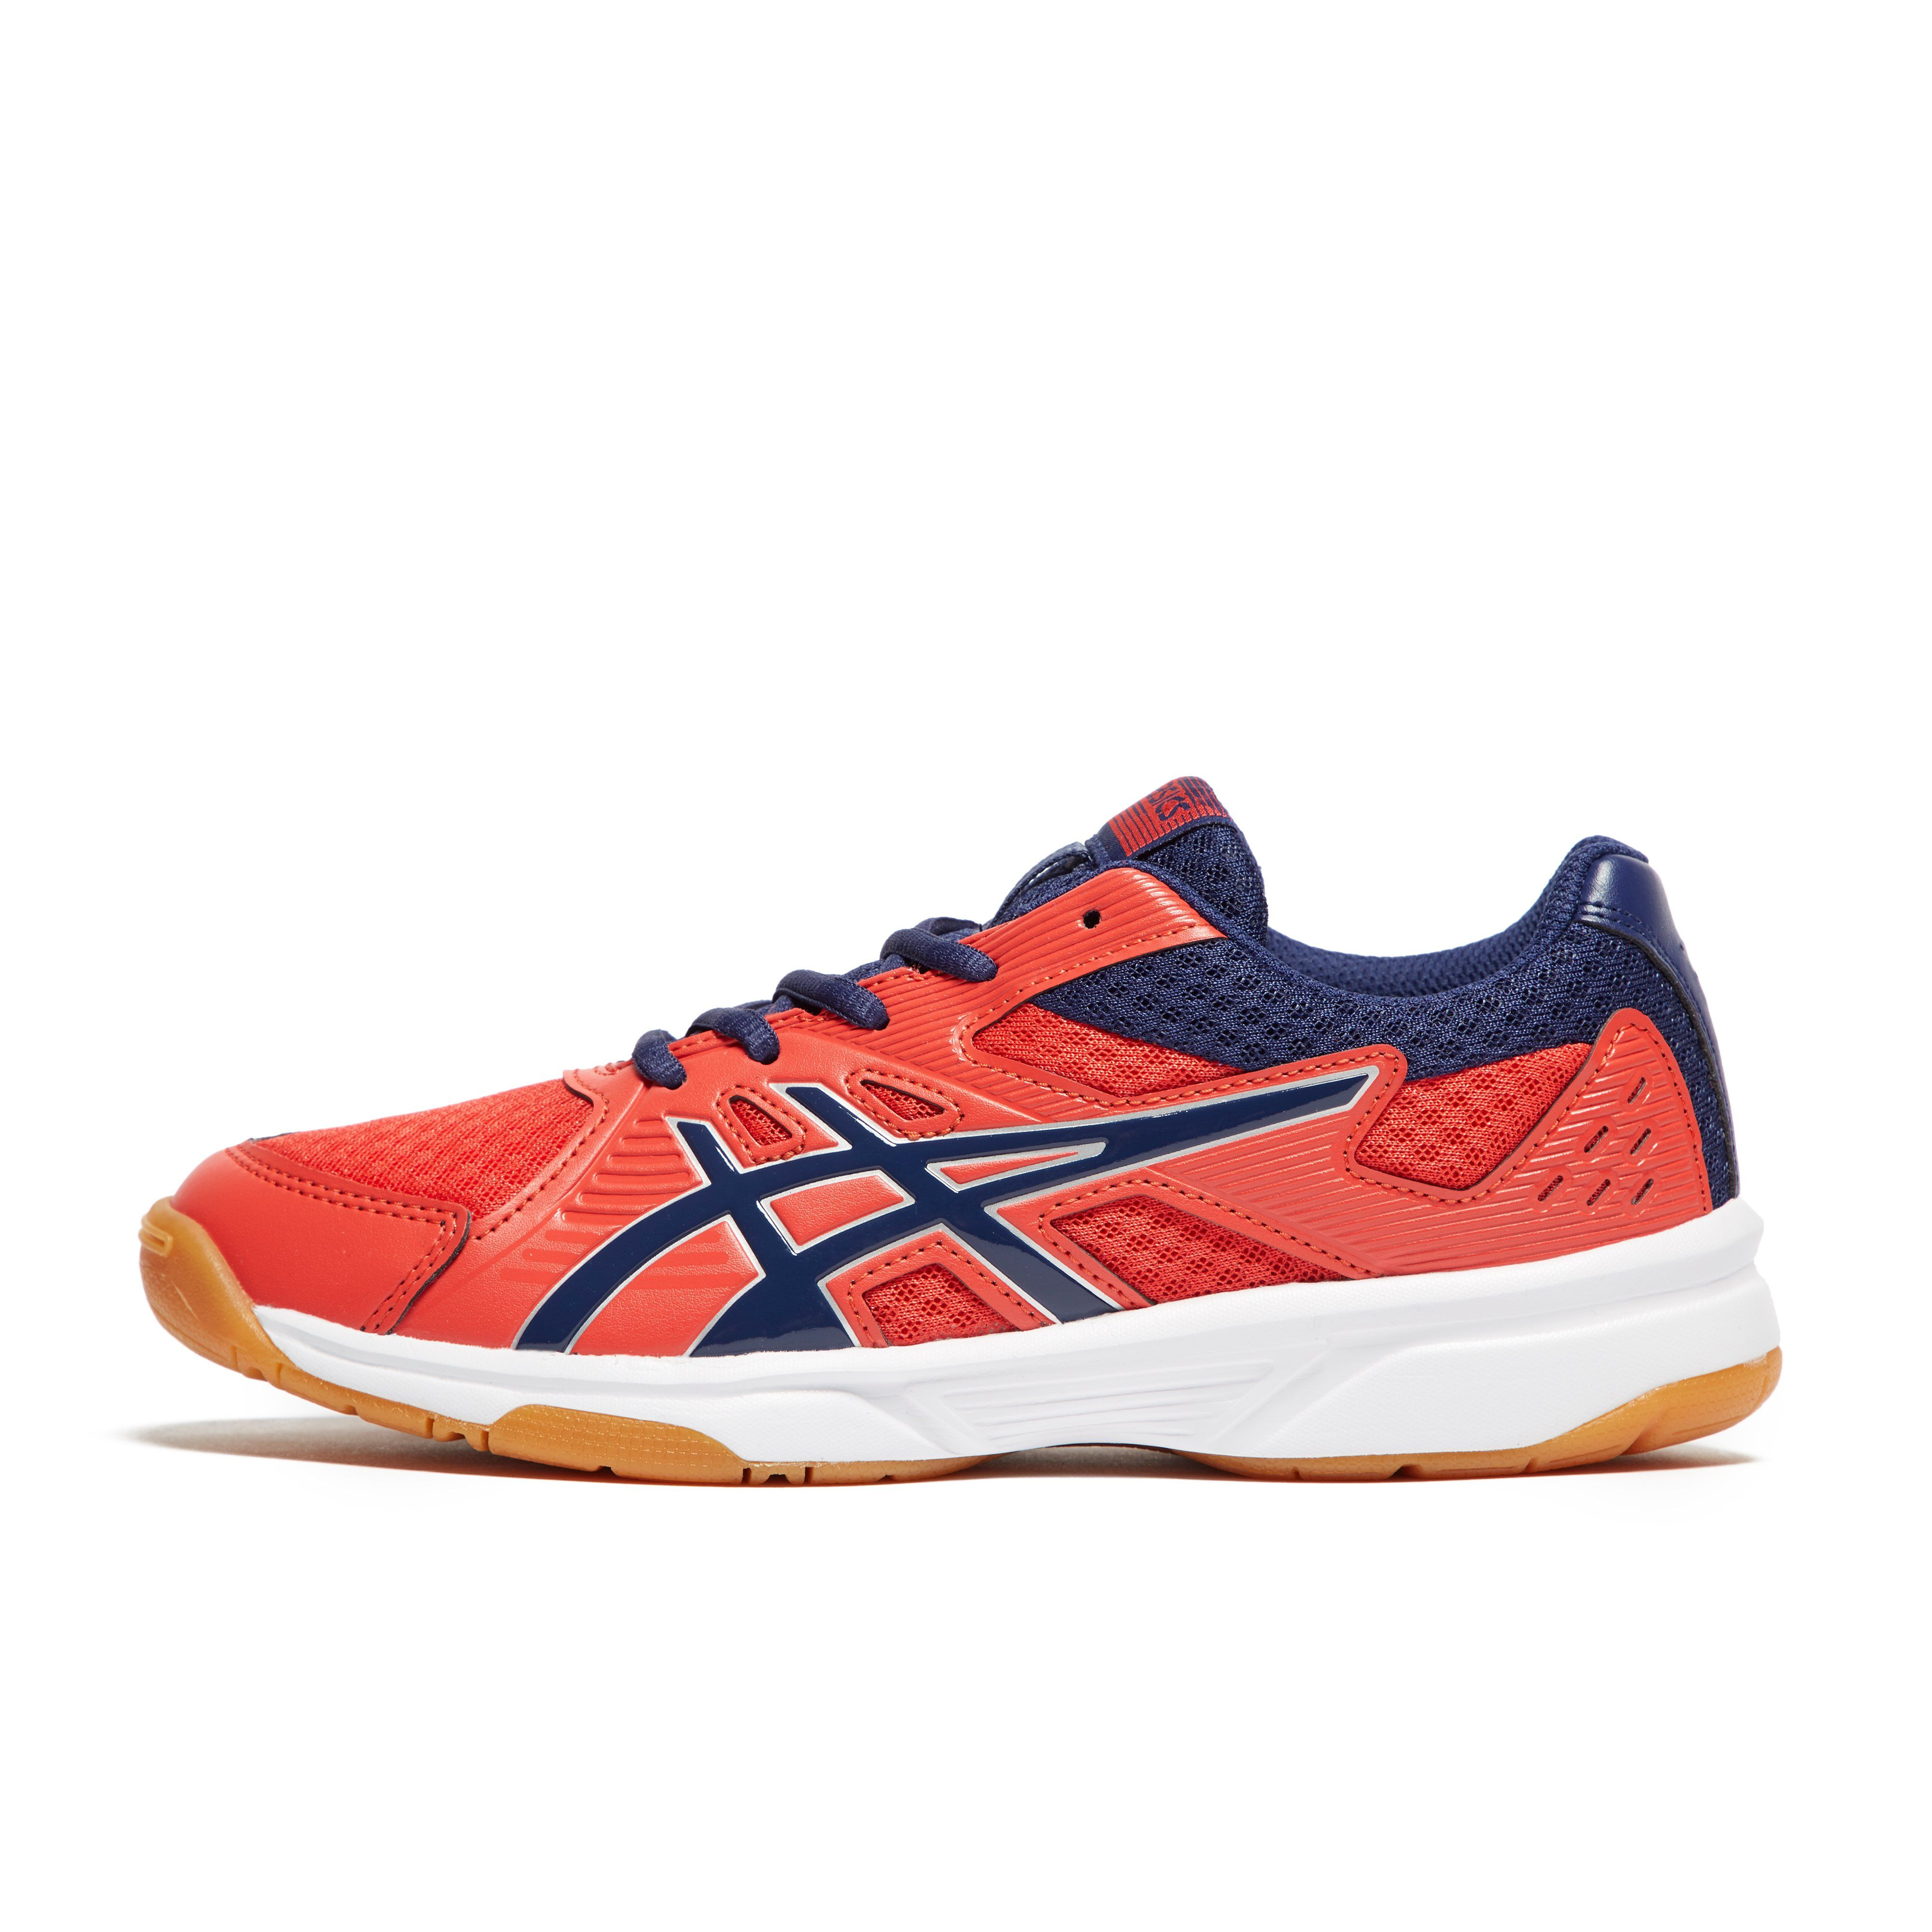 ASICS Gel-UpCourt 3 GS Indoor Court Shoes